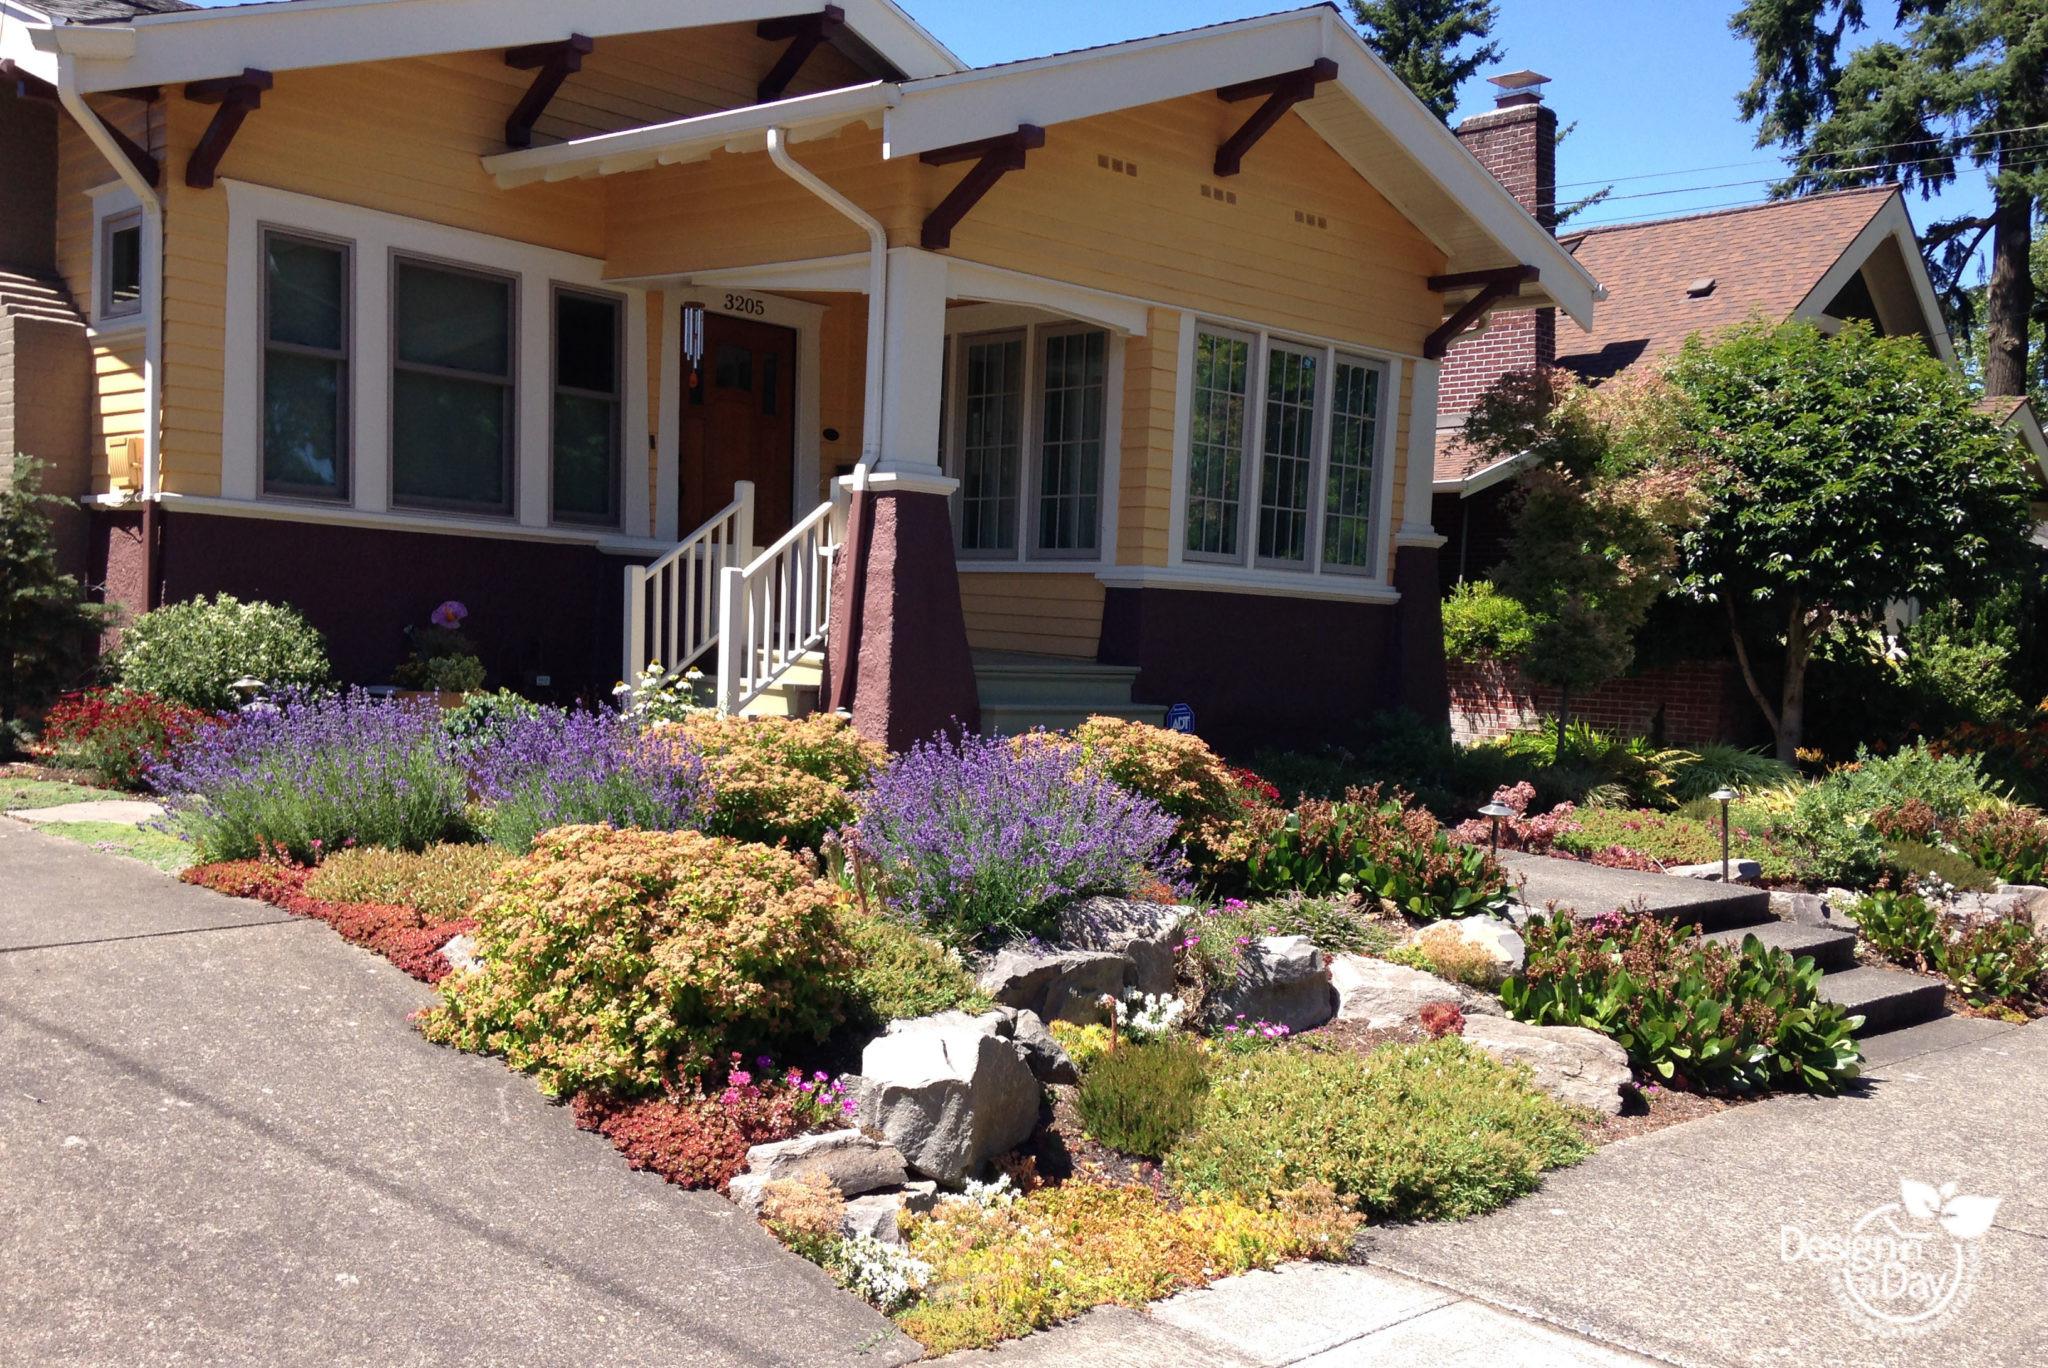 Residential Landscape Design  No Lawn Front Yards Archives Page 2 of 4 Landscape